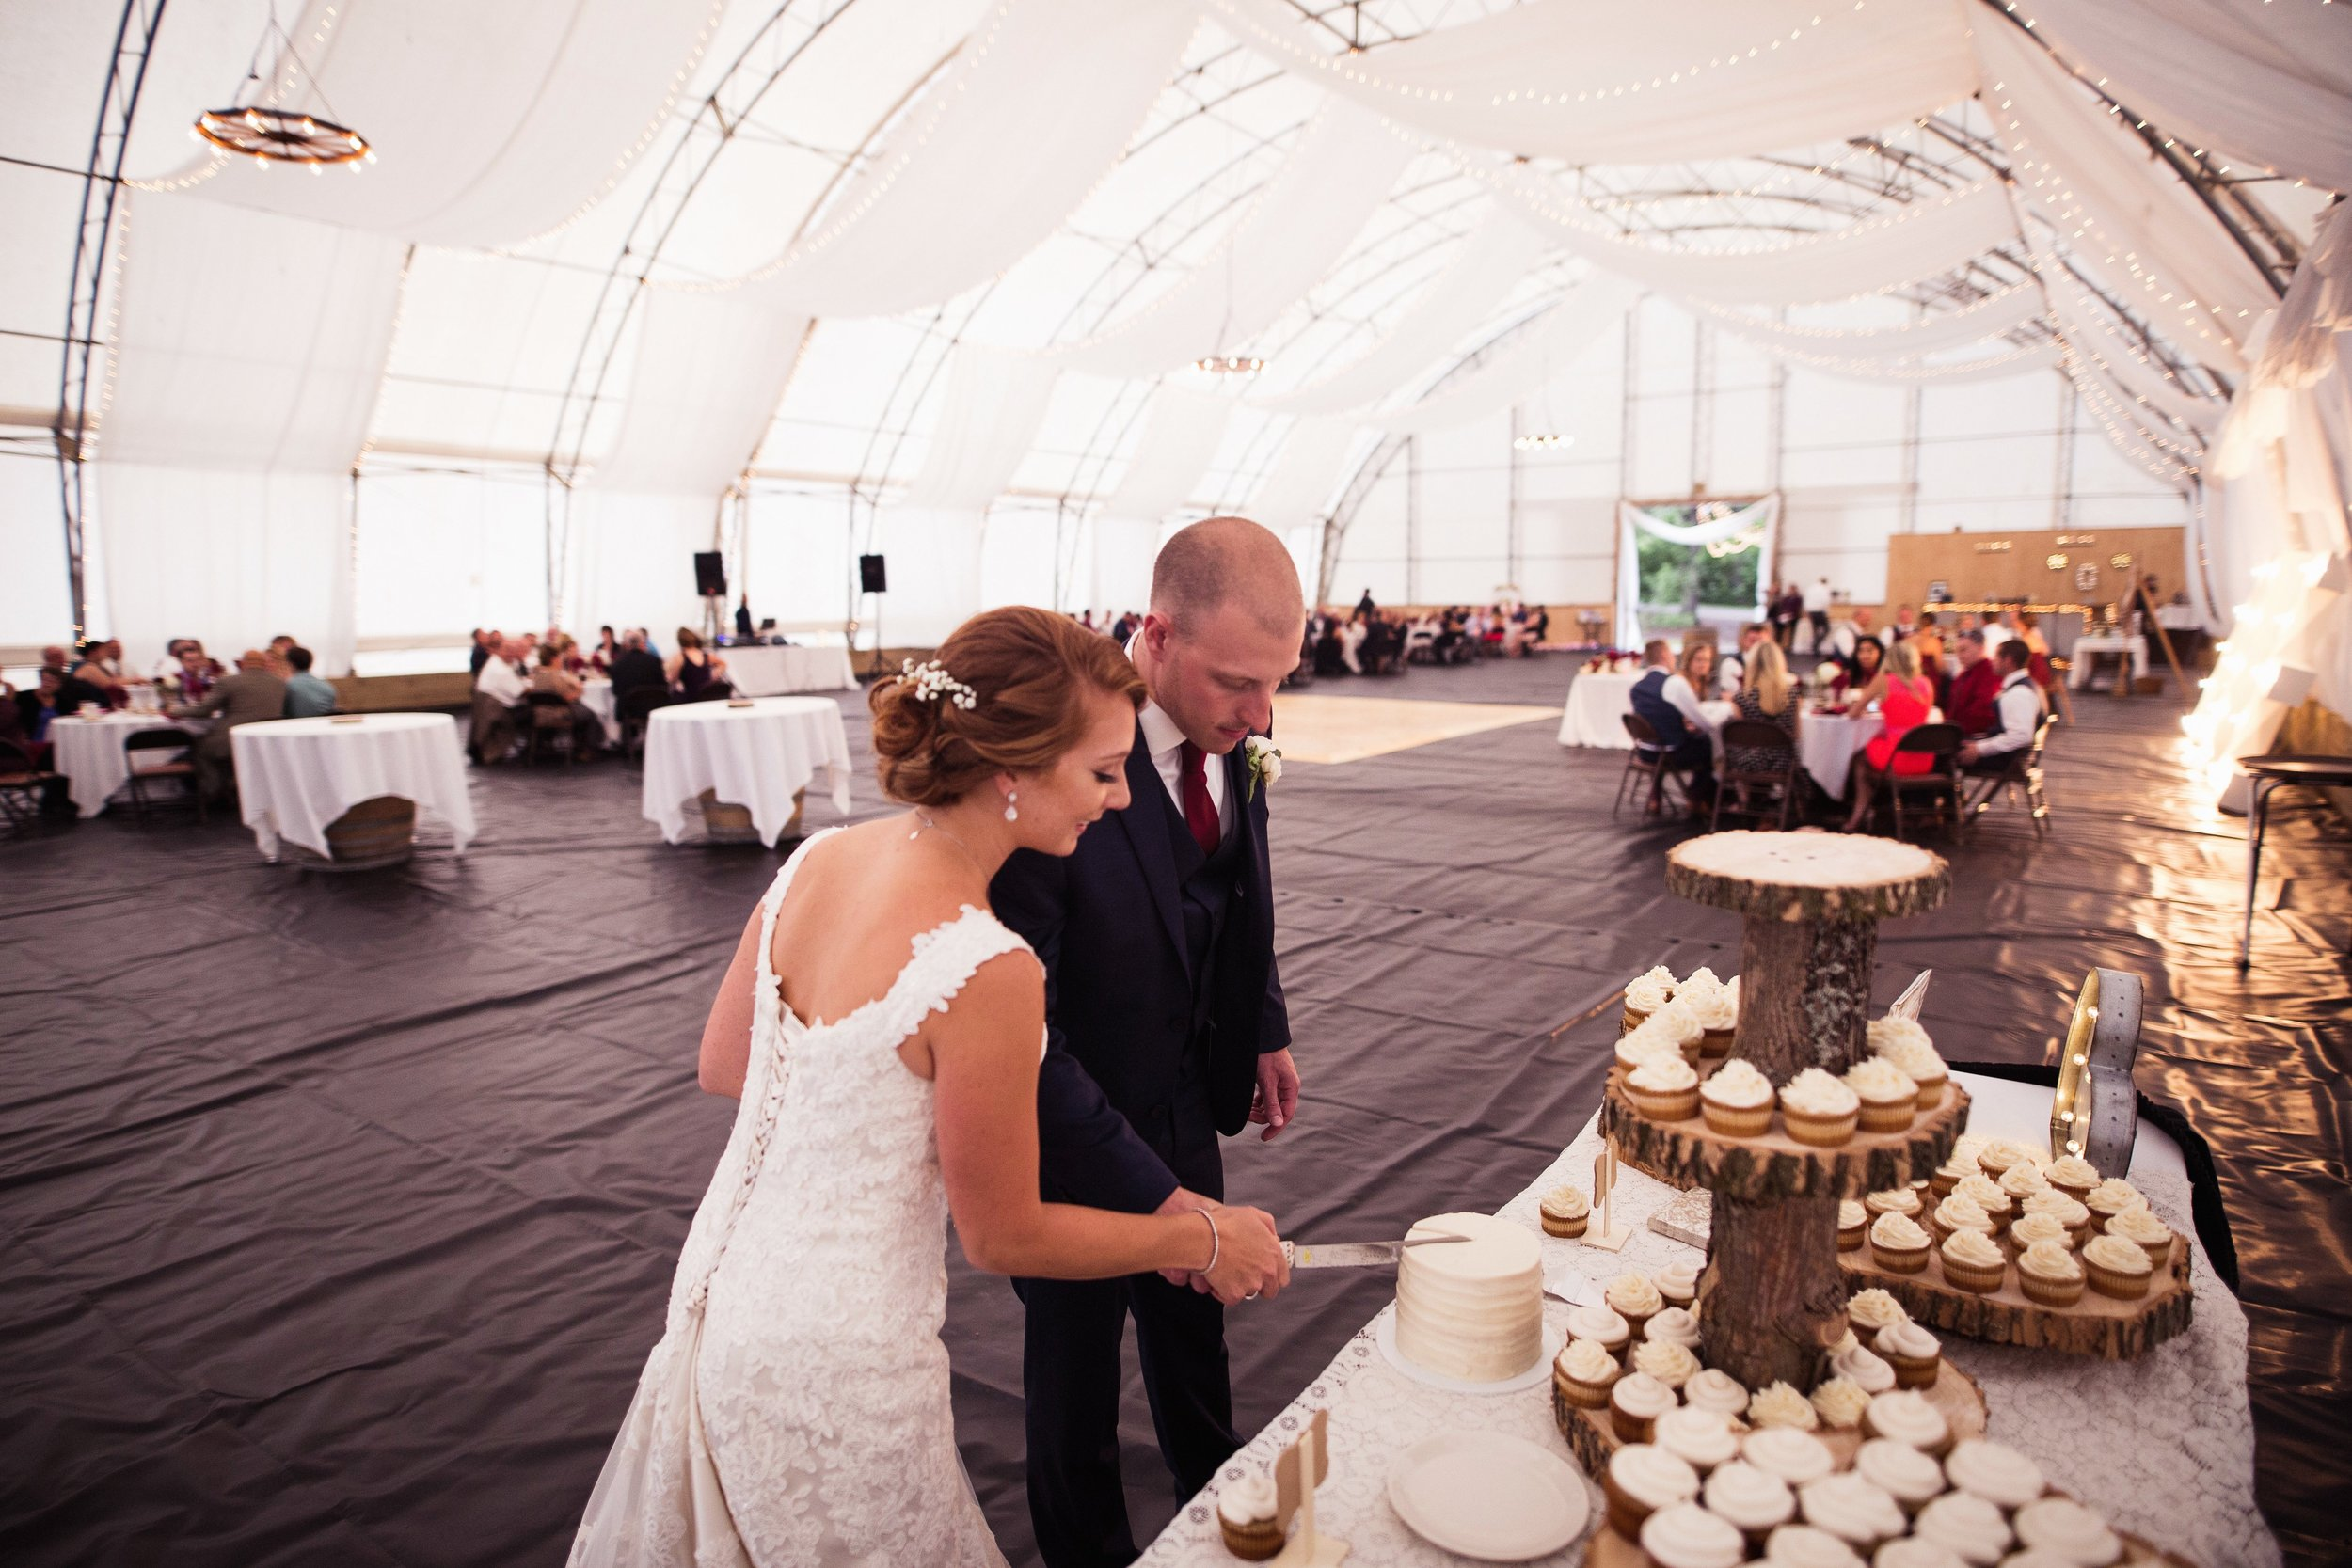 Blog-Lisa-James-Wedding-at Rosebud Estate Weddings in Arcade NY by Stefan-Ludwig-Photography-Buffalo-NY-69-x.jpg